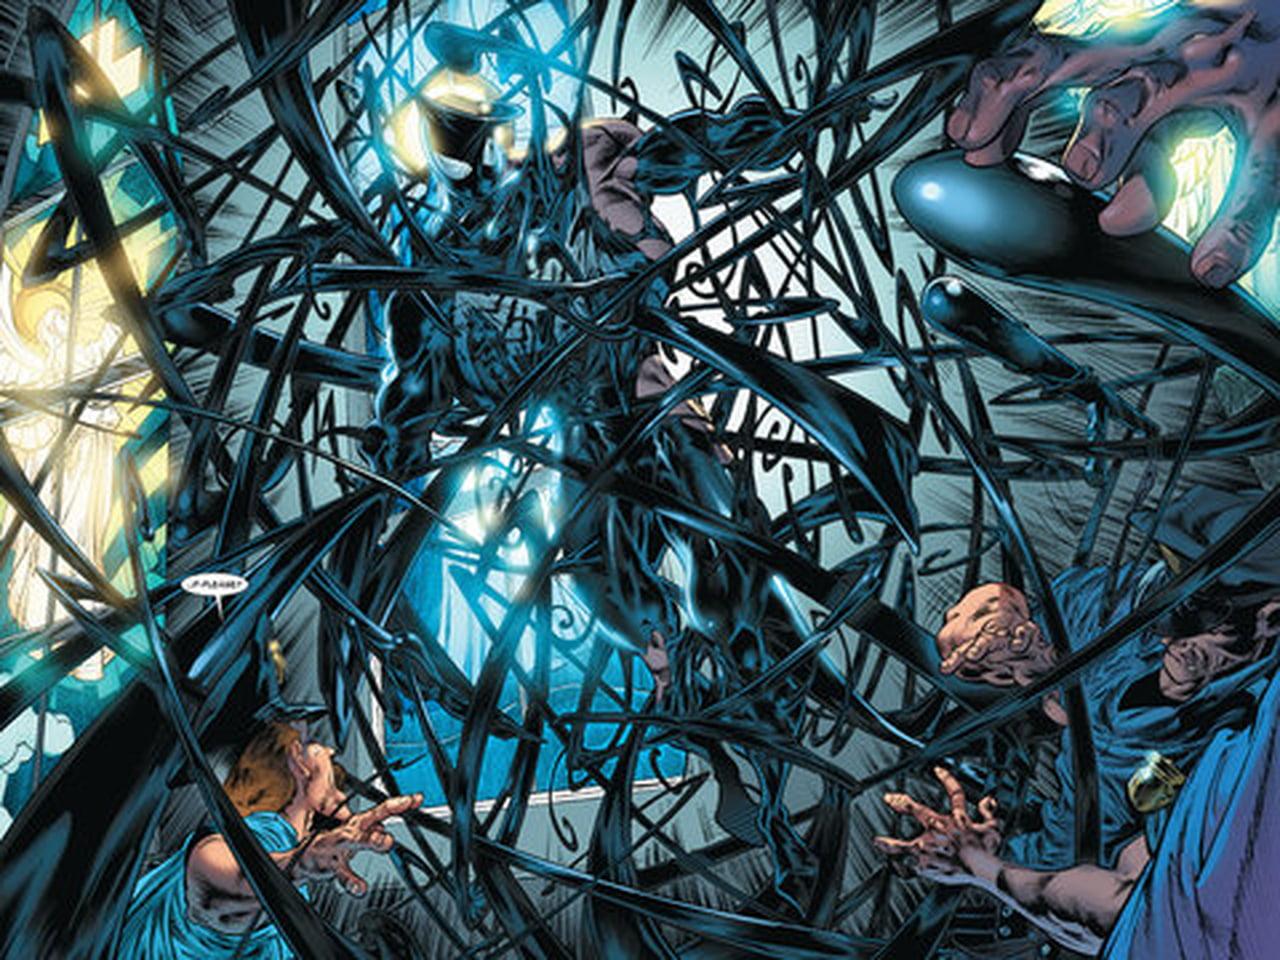 Les débuts de Venom (droits réservés à Marvel Comics)